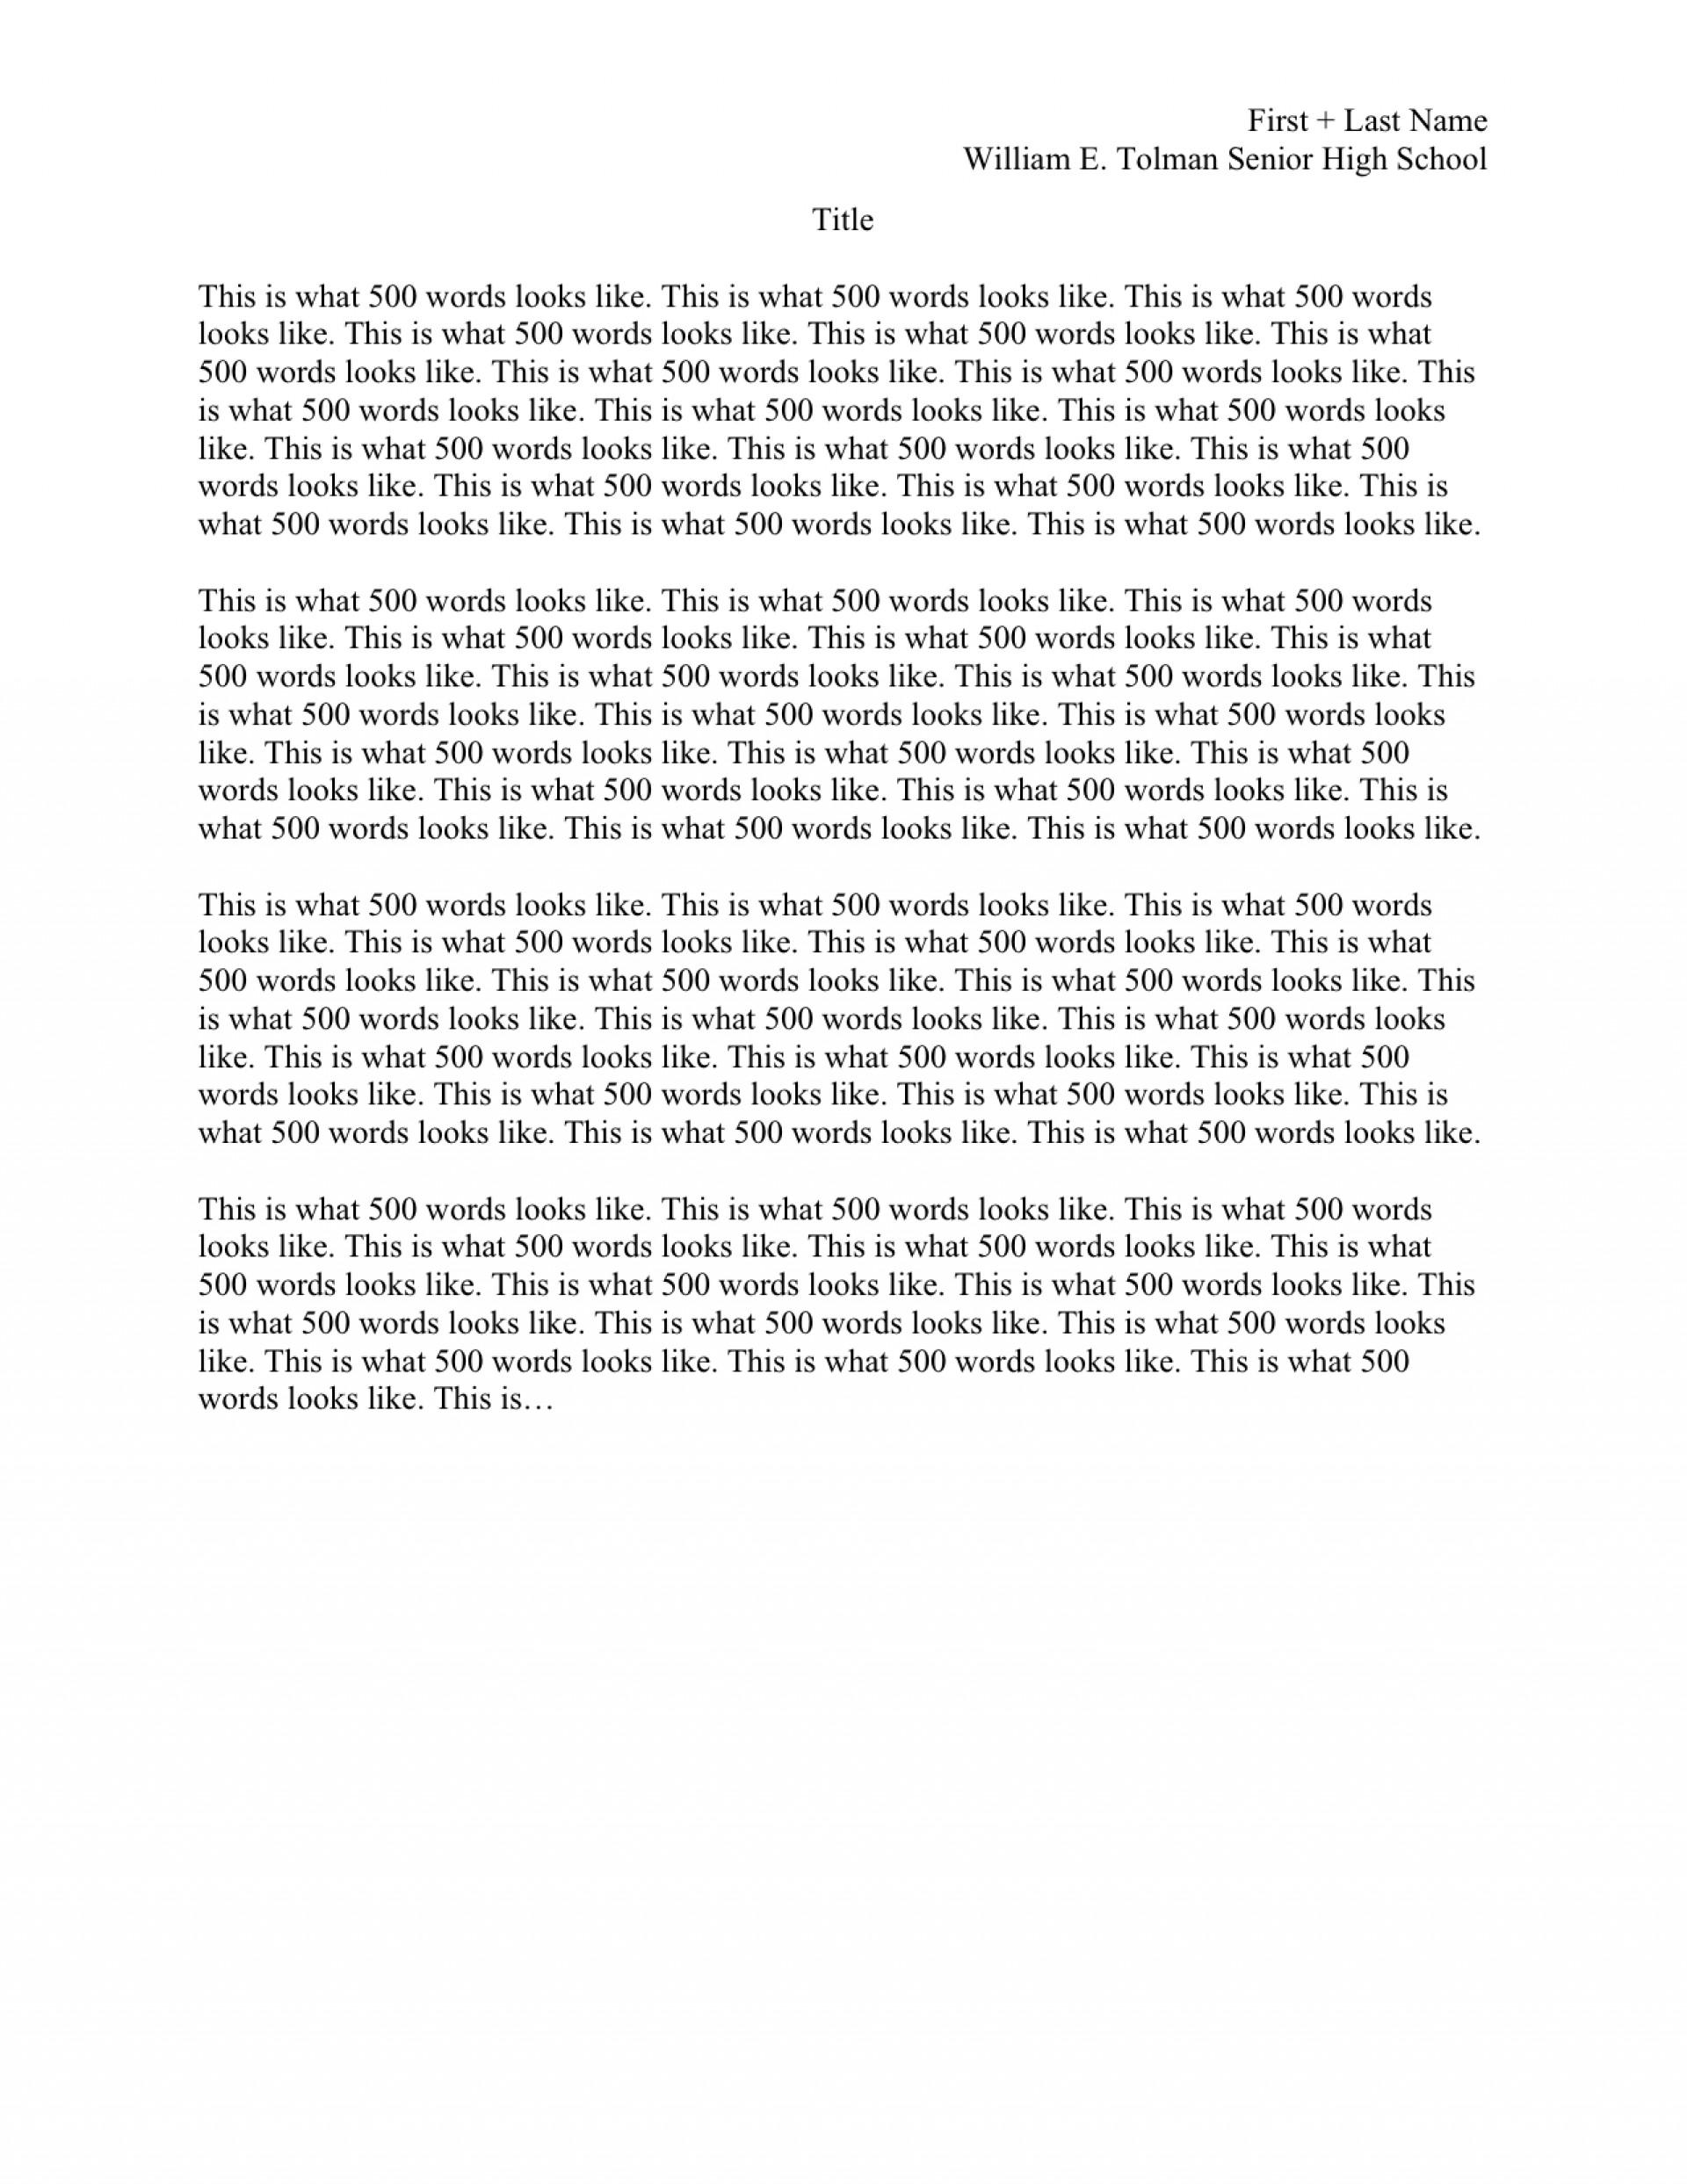 012 Essay Example Write Essays For Money College Best Uni Scholarship 1920